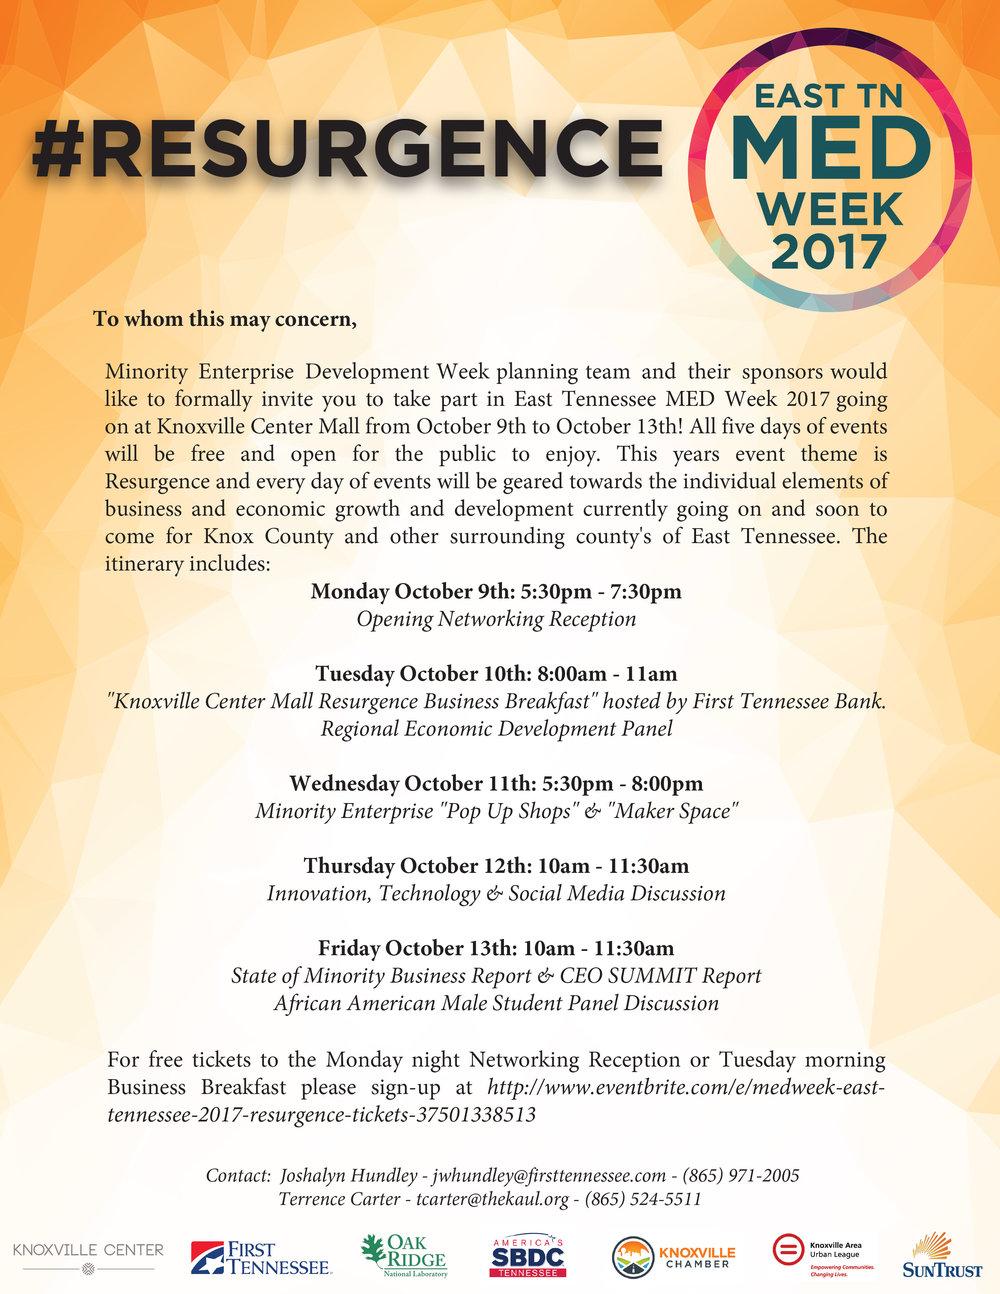 Resurgence_MEDWeek2017_Invite.jpg